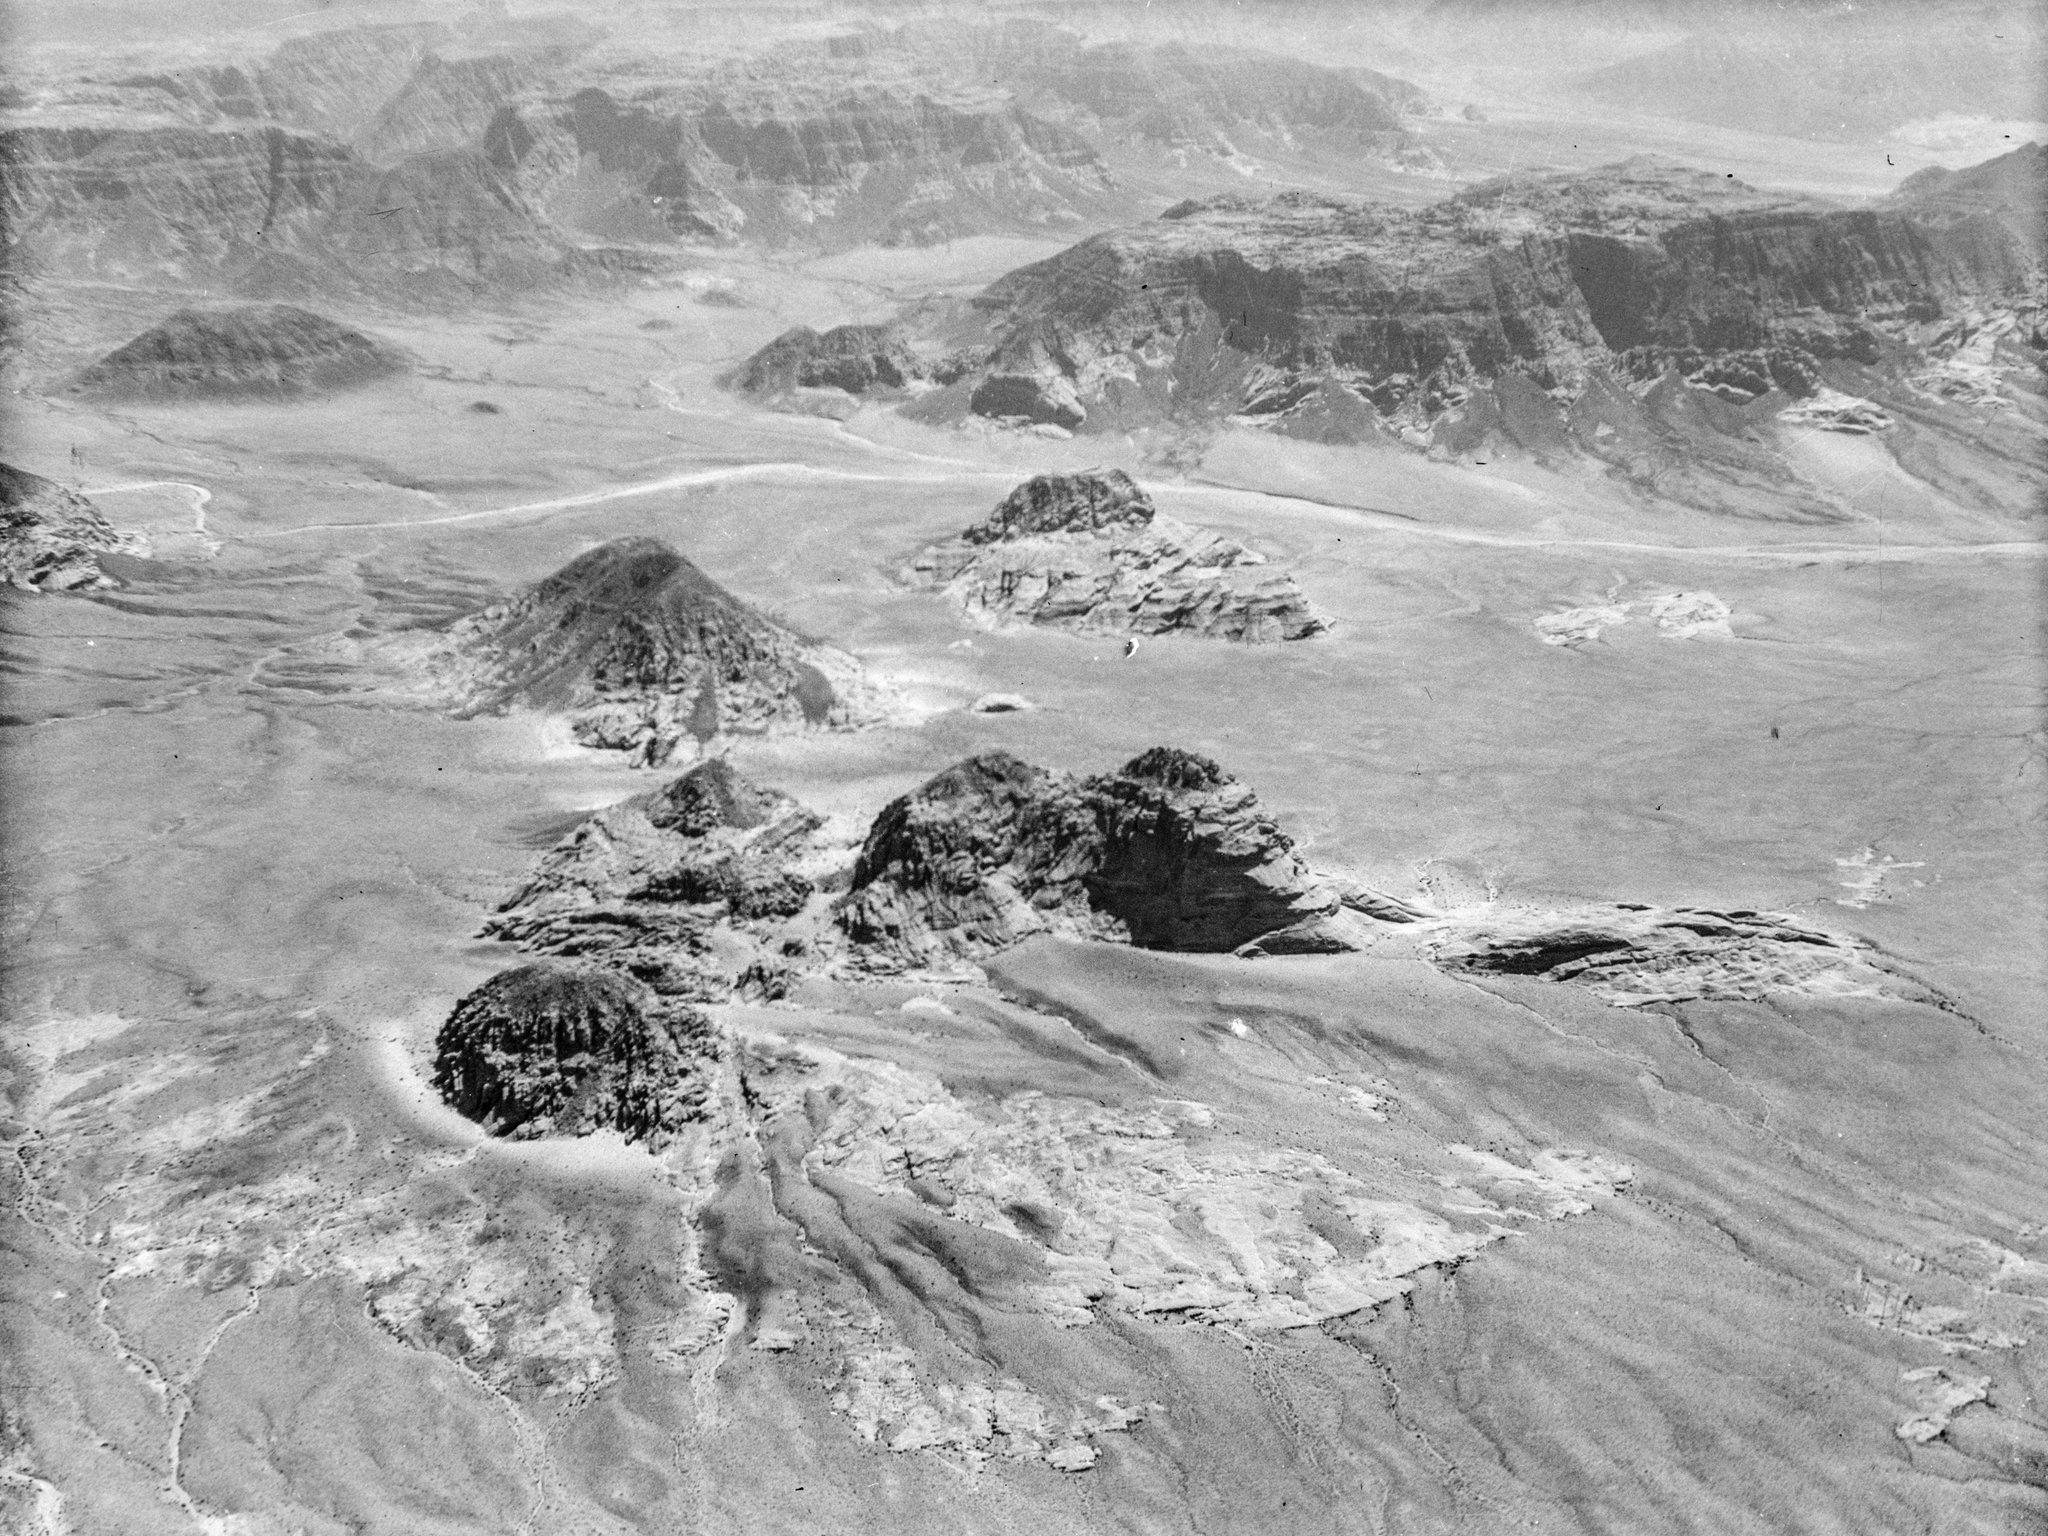 Flyfoto av Wadi Rum i sørlege Transjordan